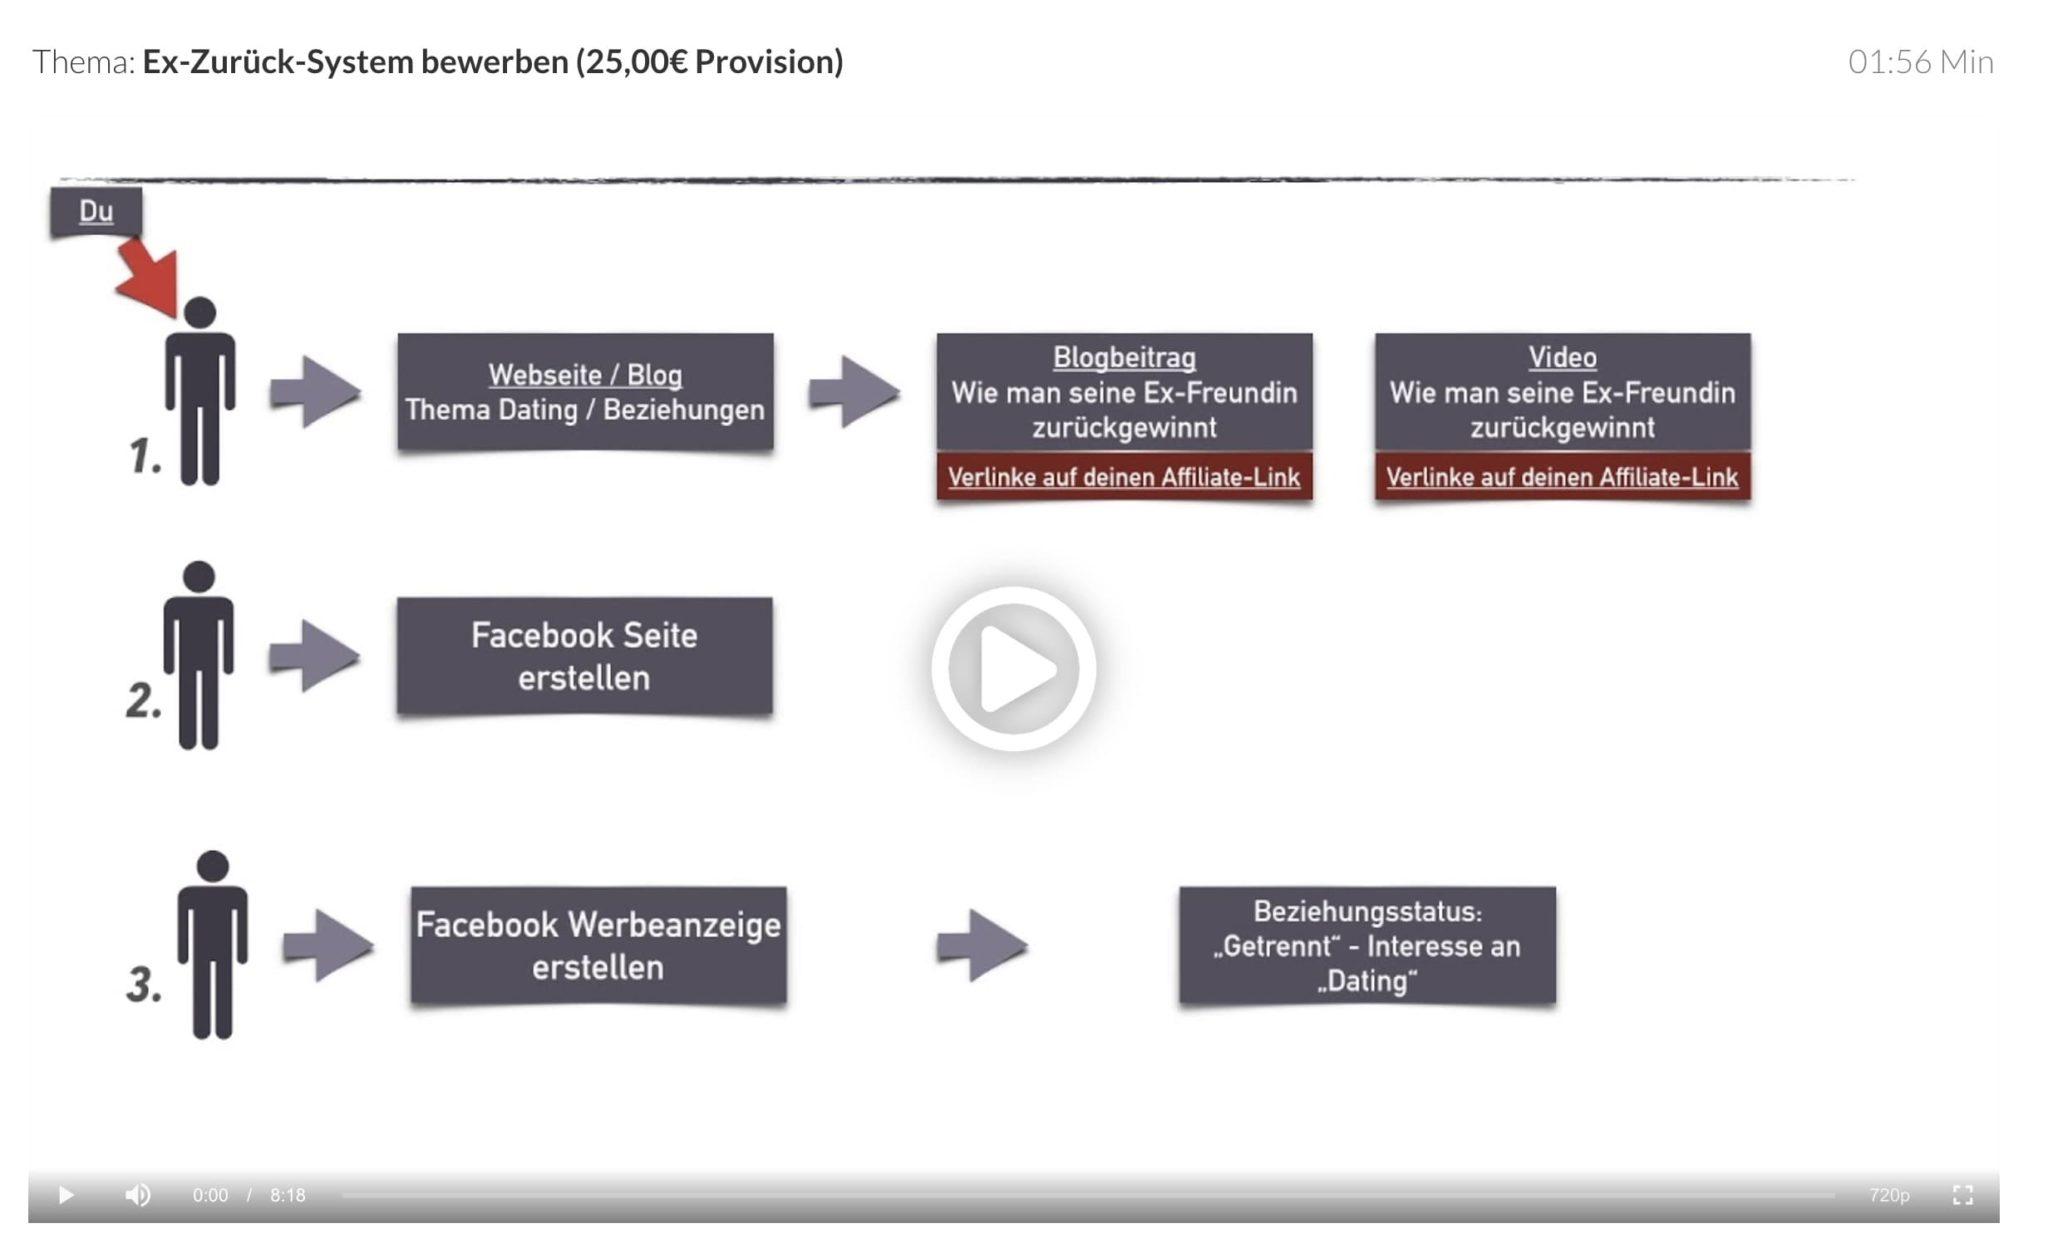 Facebook Ads Anleitung 2.0 S - Ex-Zurueck-System bewerben